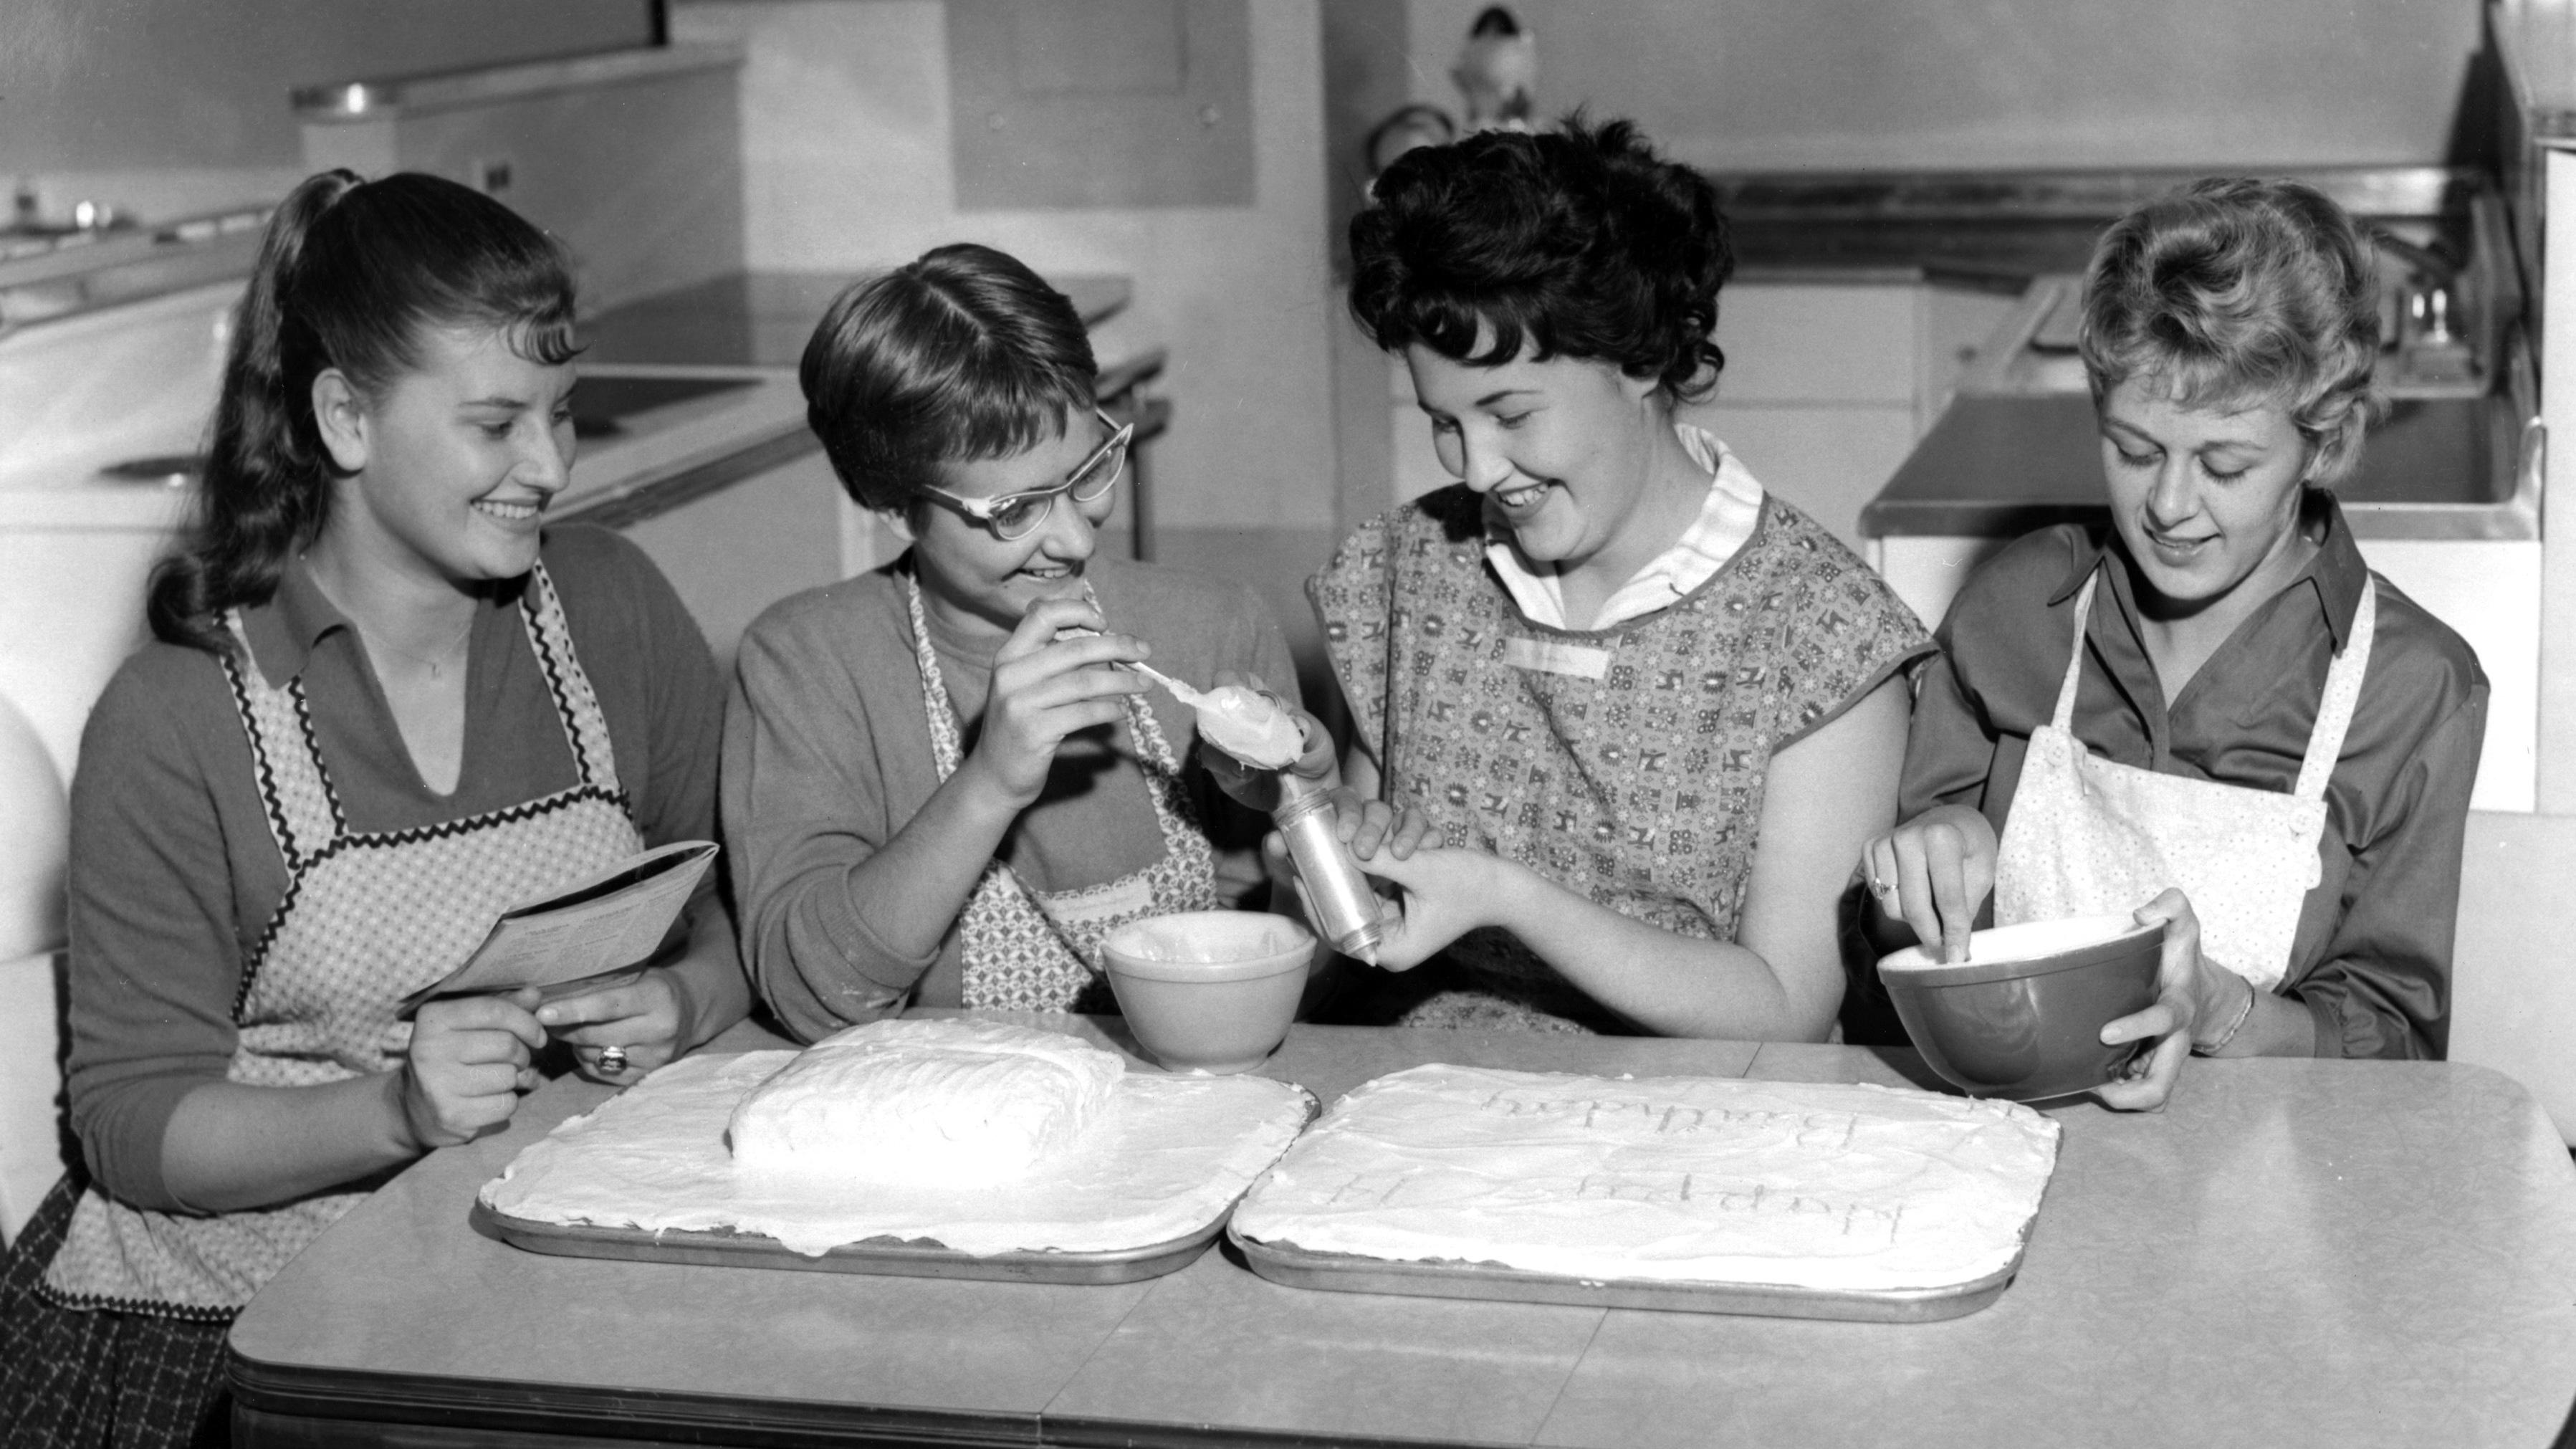 Despite A Revamped Focus On Real Life Skills Home Ec Classes Fade Away The Salt Npr